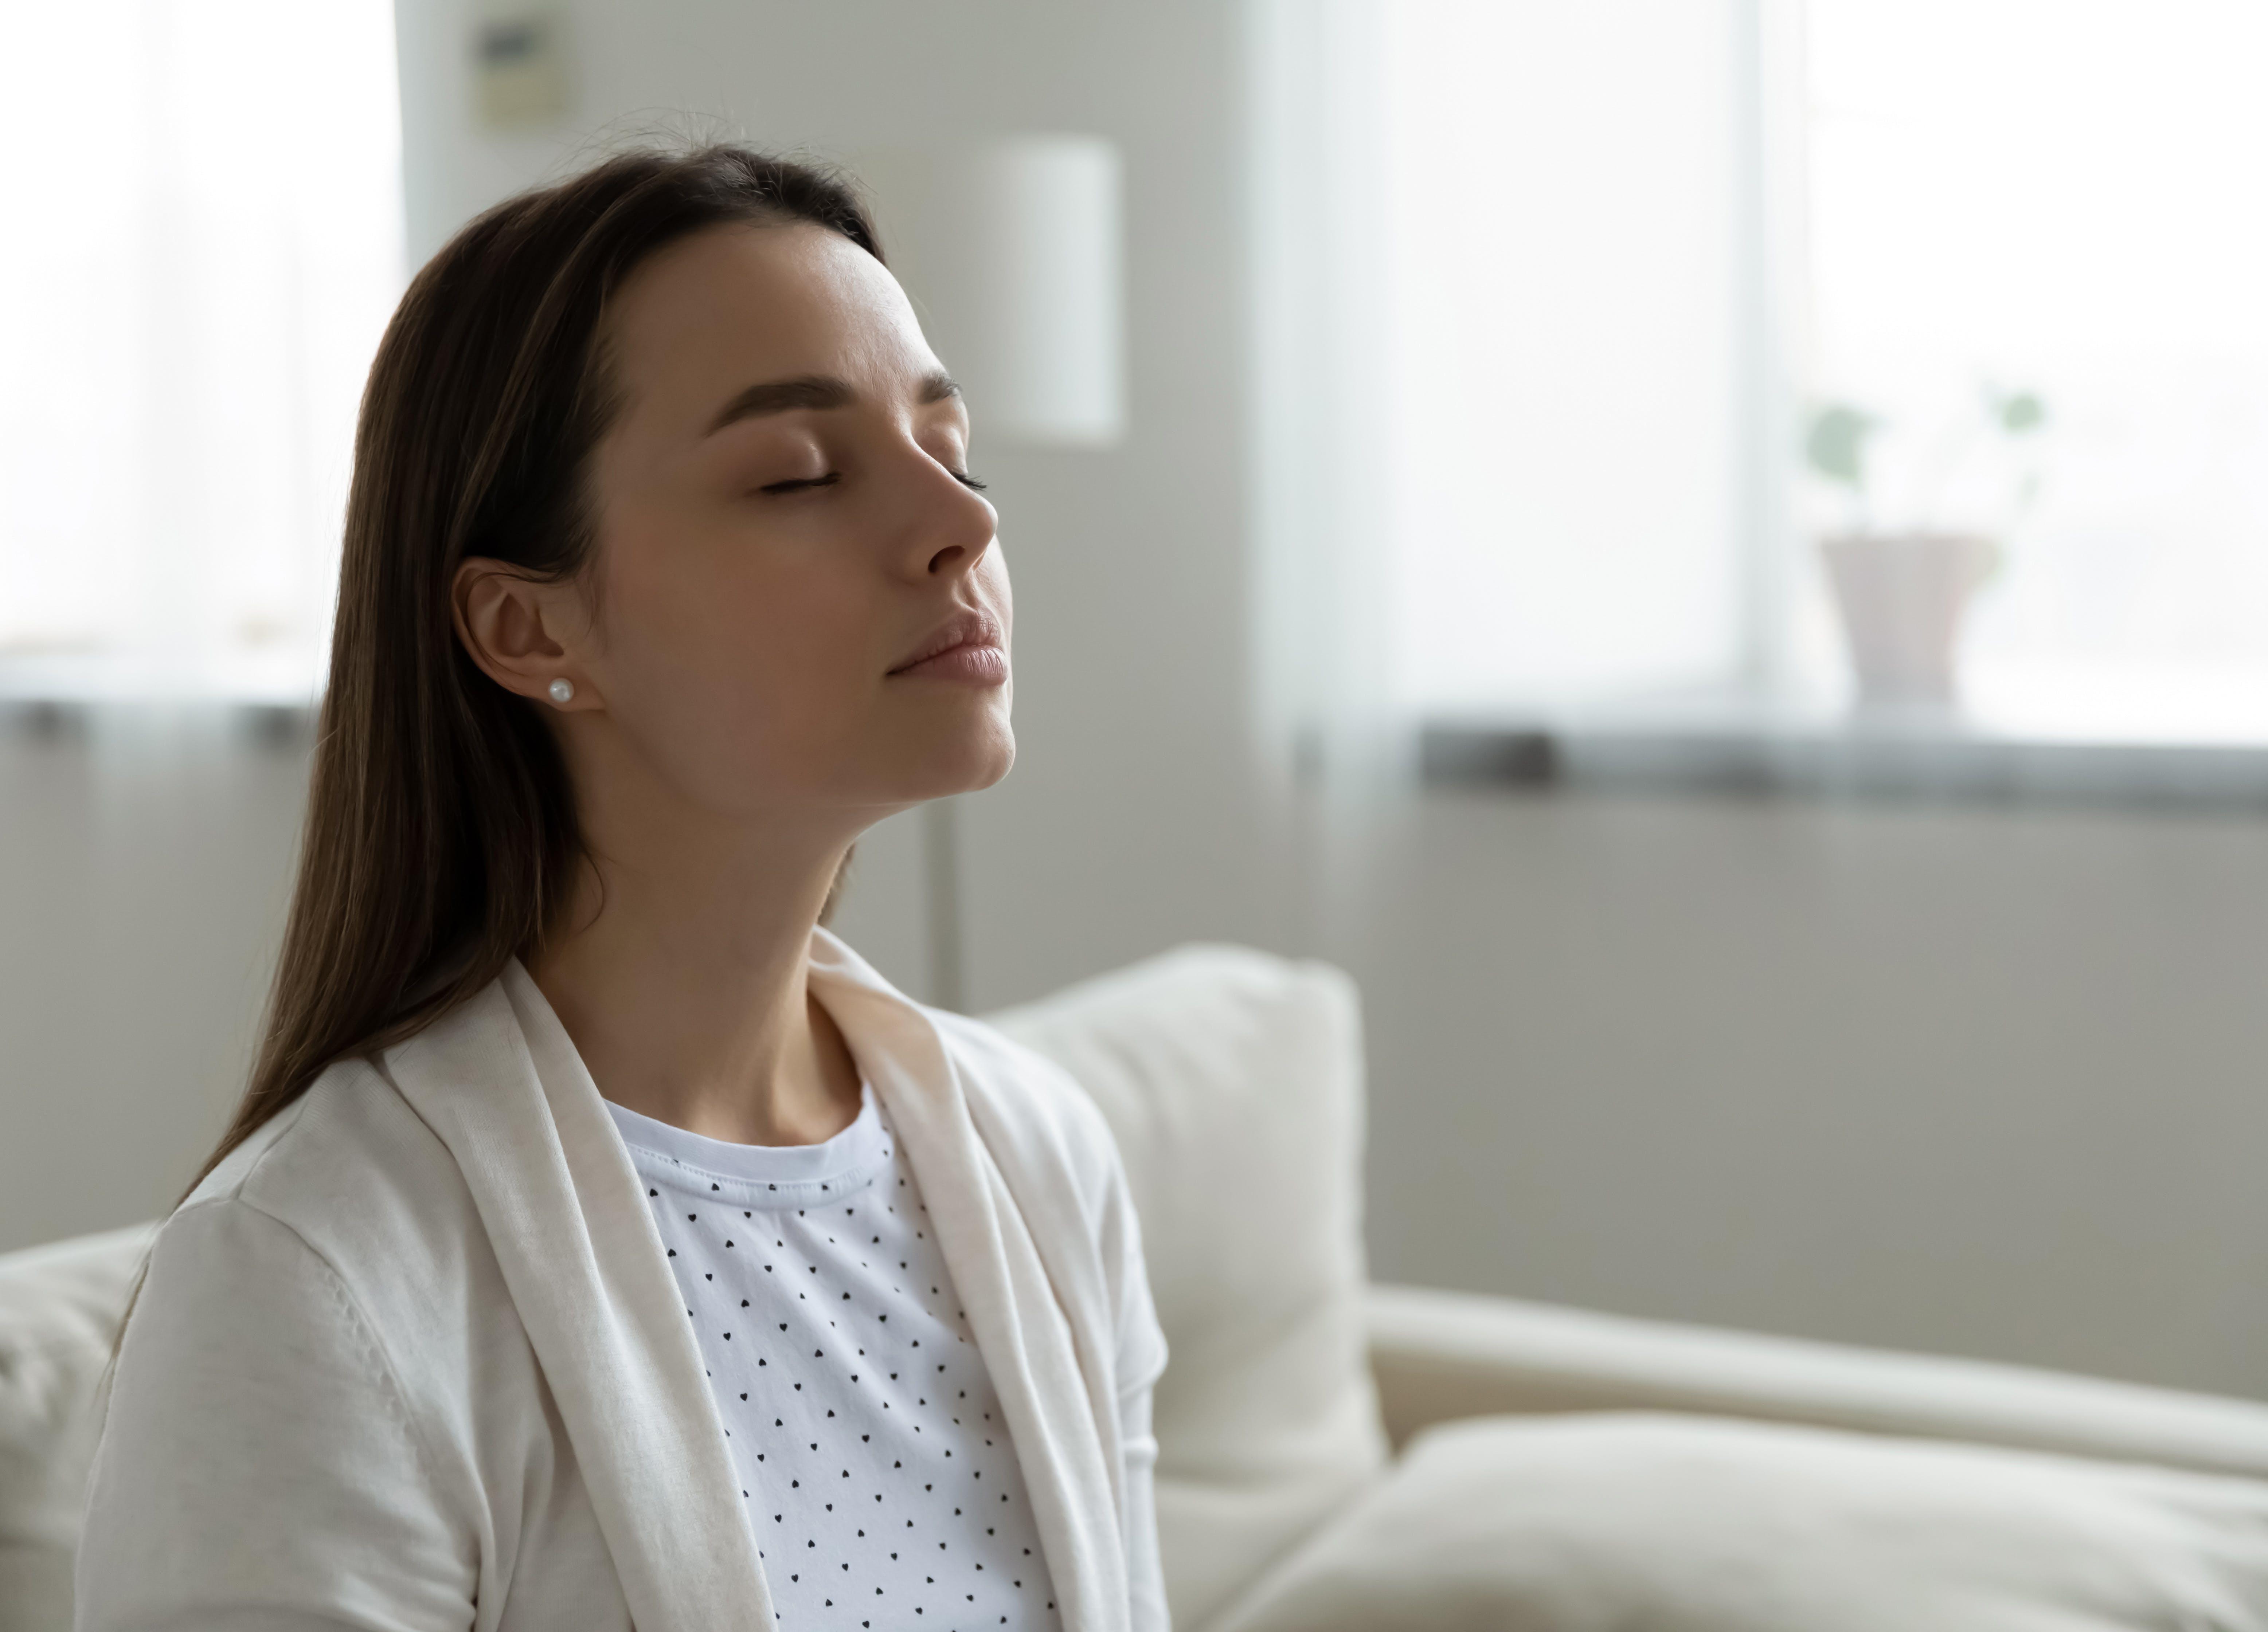 home air quality woman inhaling 728x524